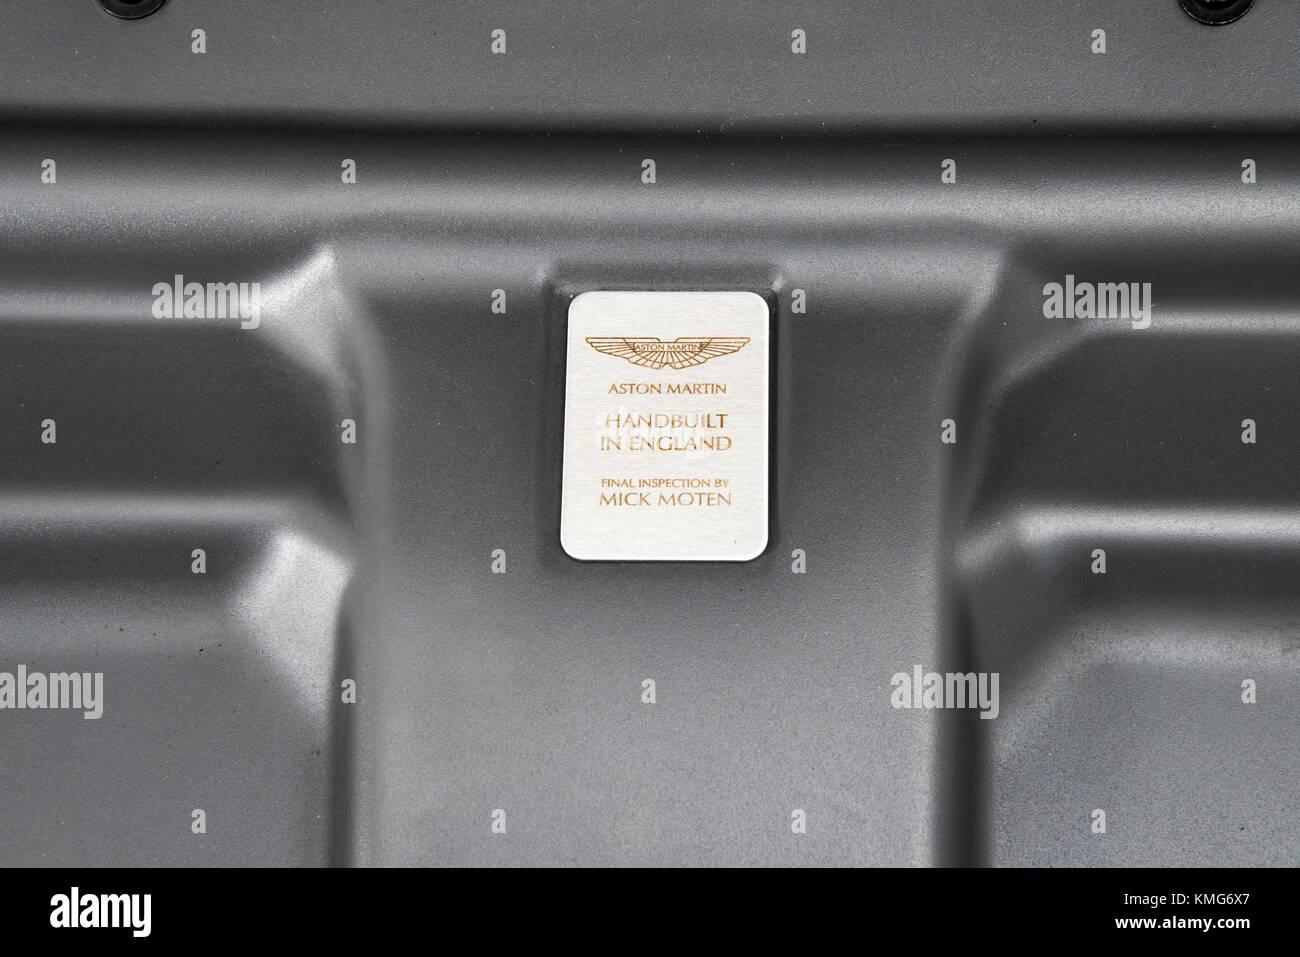 2007 Aston Martin DBS V12 - Stock Image